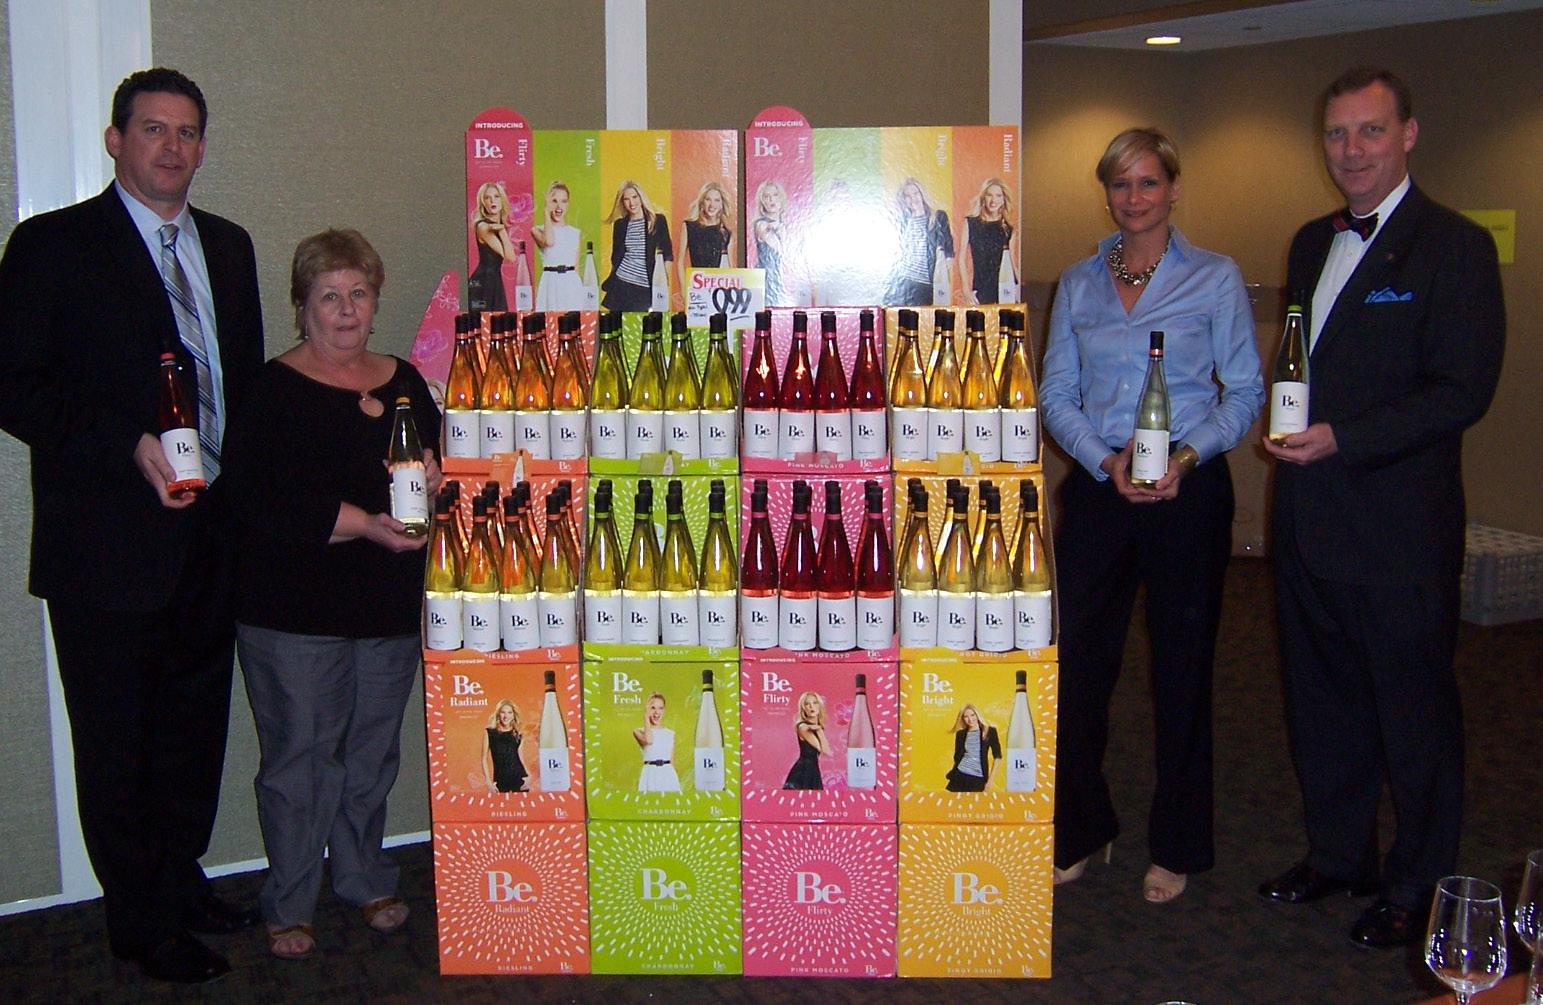 Treasury Wine Estates & Eder Bros. Launch Be. Wines